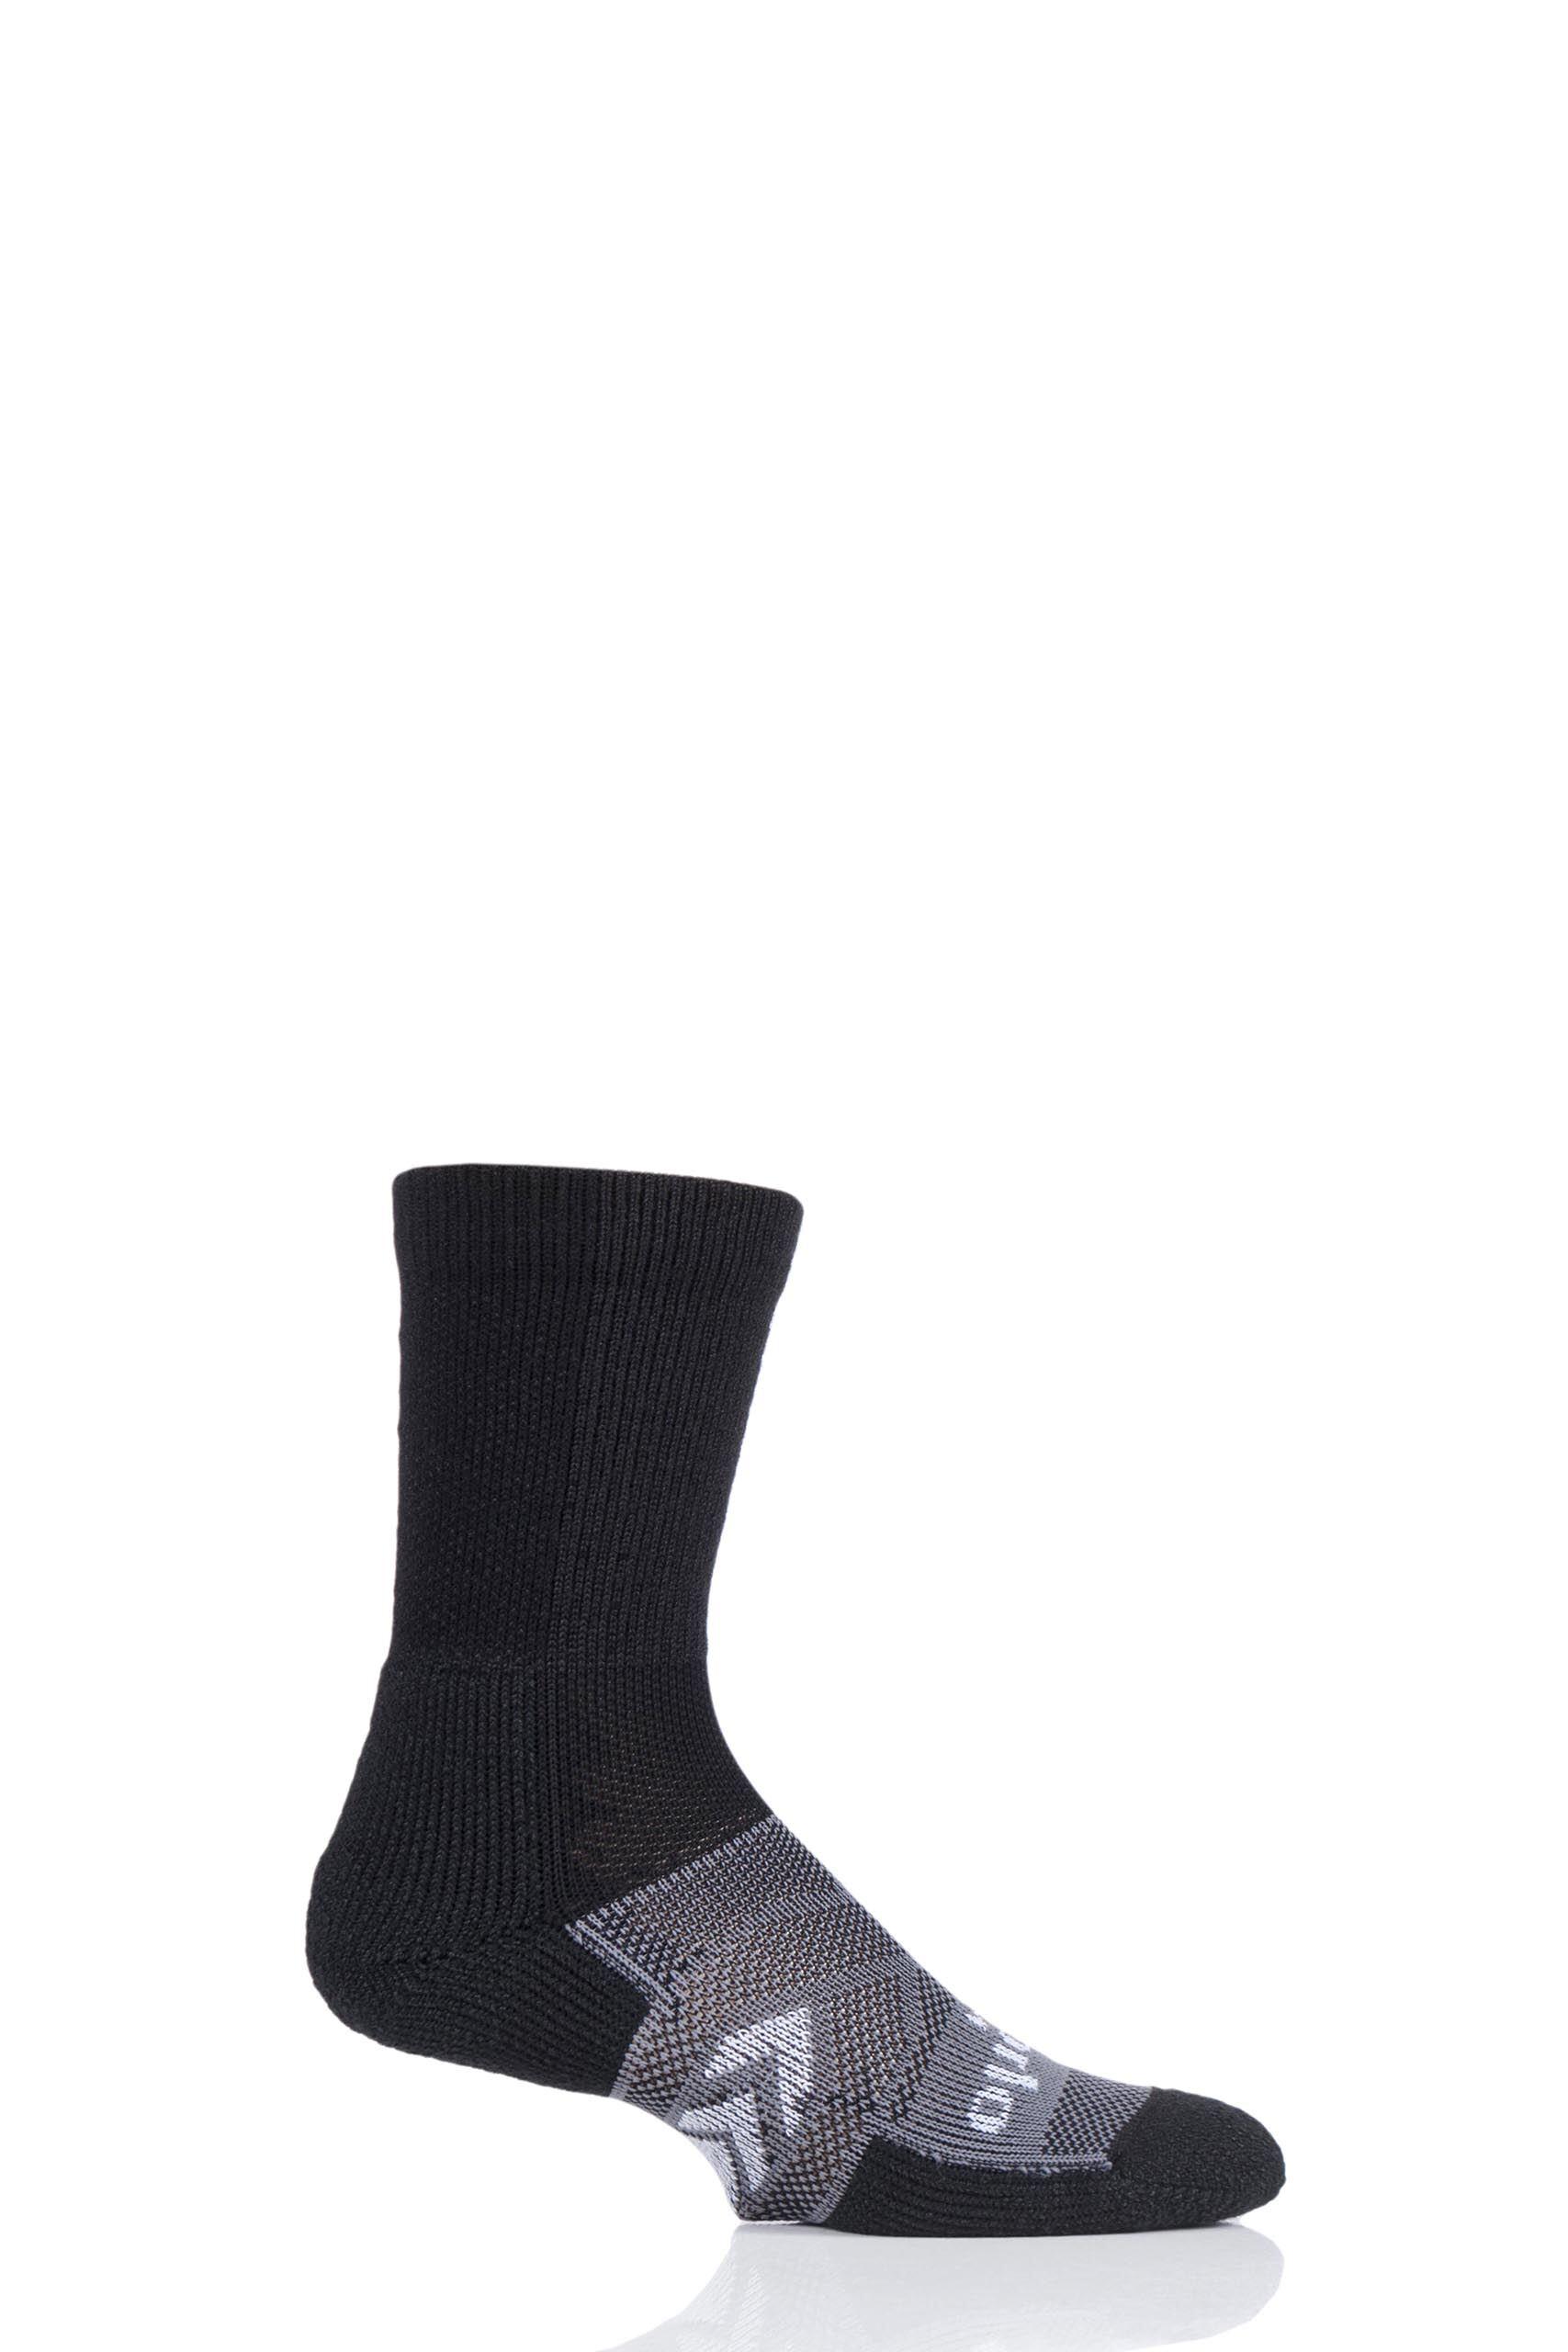 Image of 1 Pair Black 12 Hour Shift Work Socks Unisex 9-12.5 Mens - Thorlos